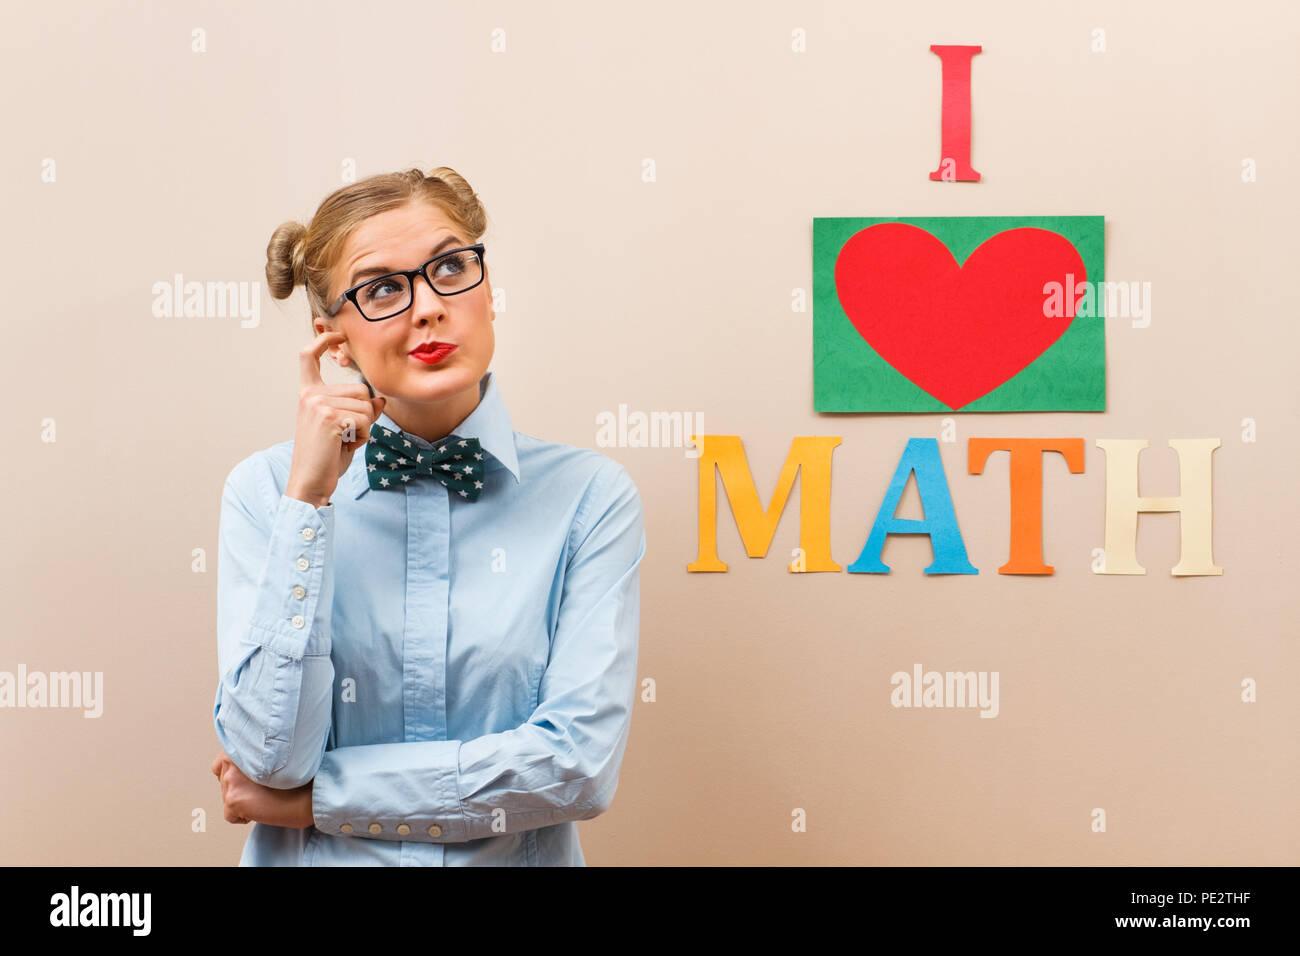 Mathematician thinking - Stock Image